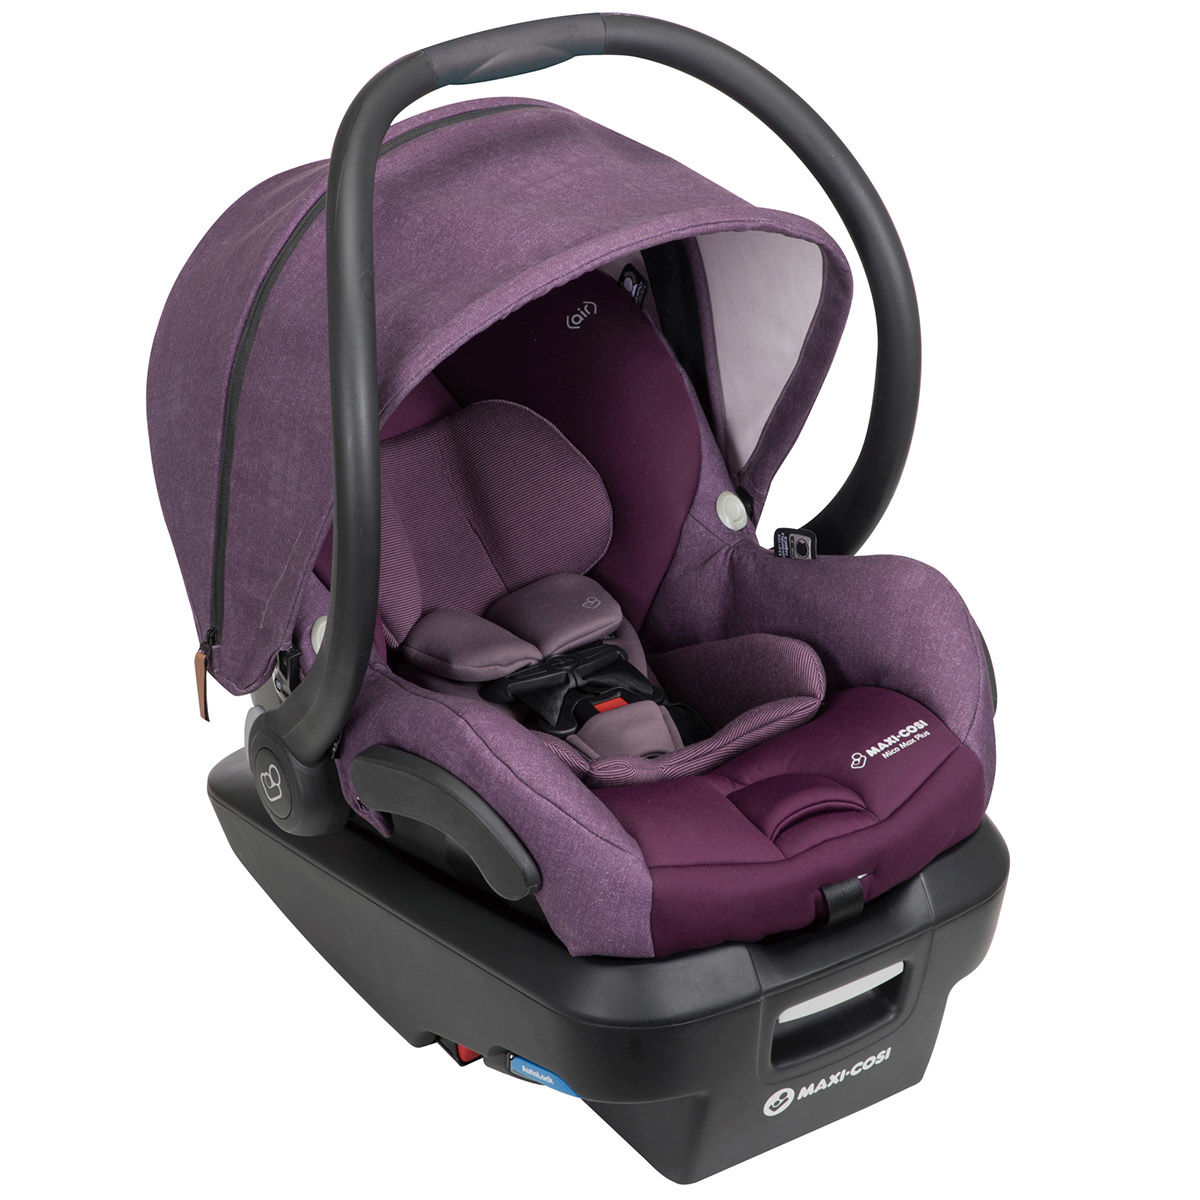 Maxi Cosi Mico Max Plus Car Seat